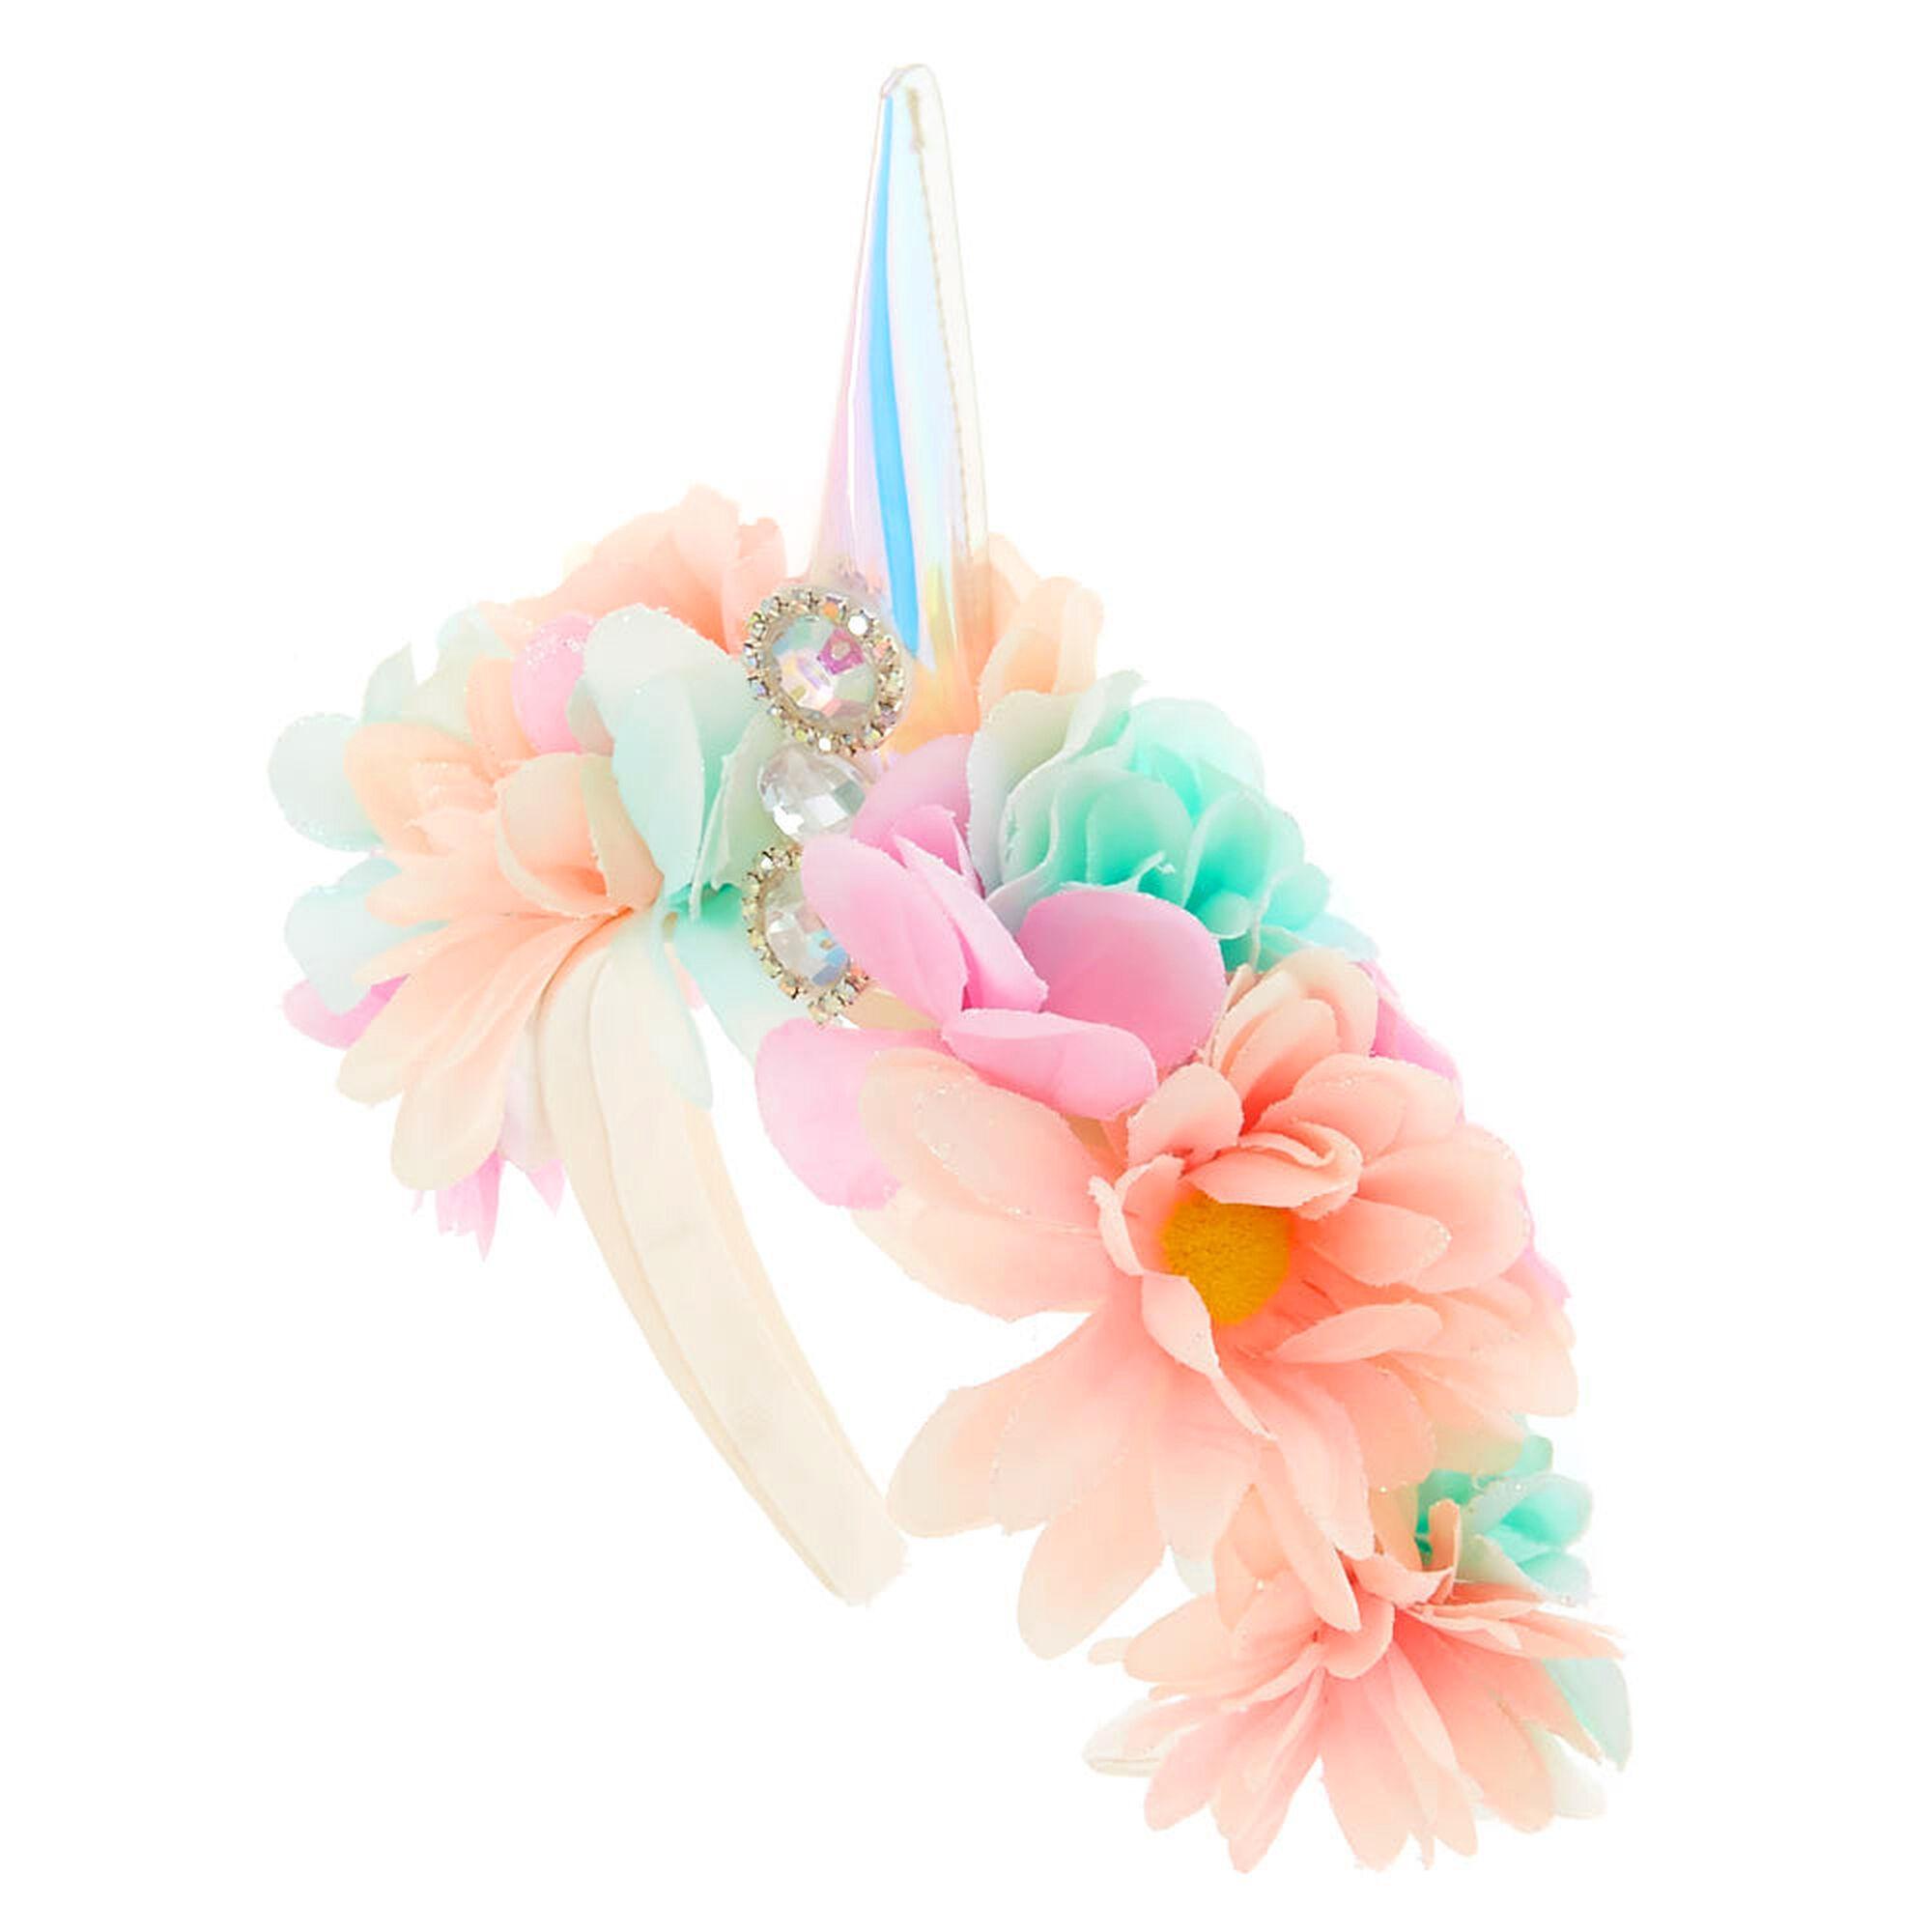 Light up unicorn flower crown headband claires us light up unicorn flower crown headband izmirmasajfo